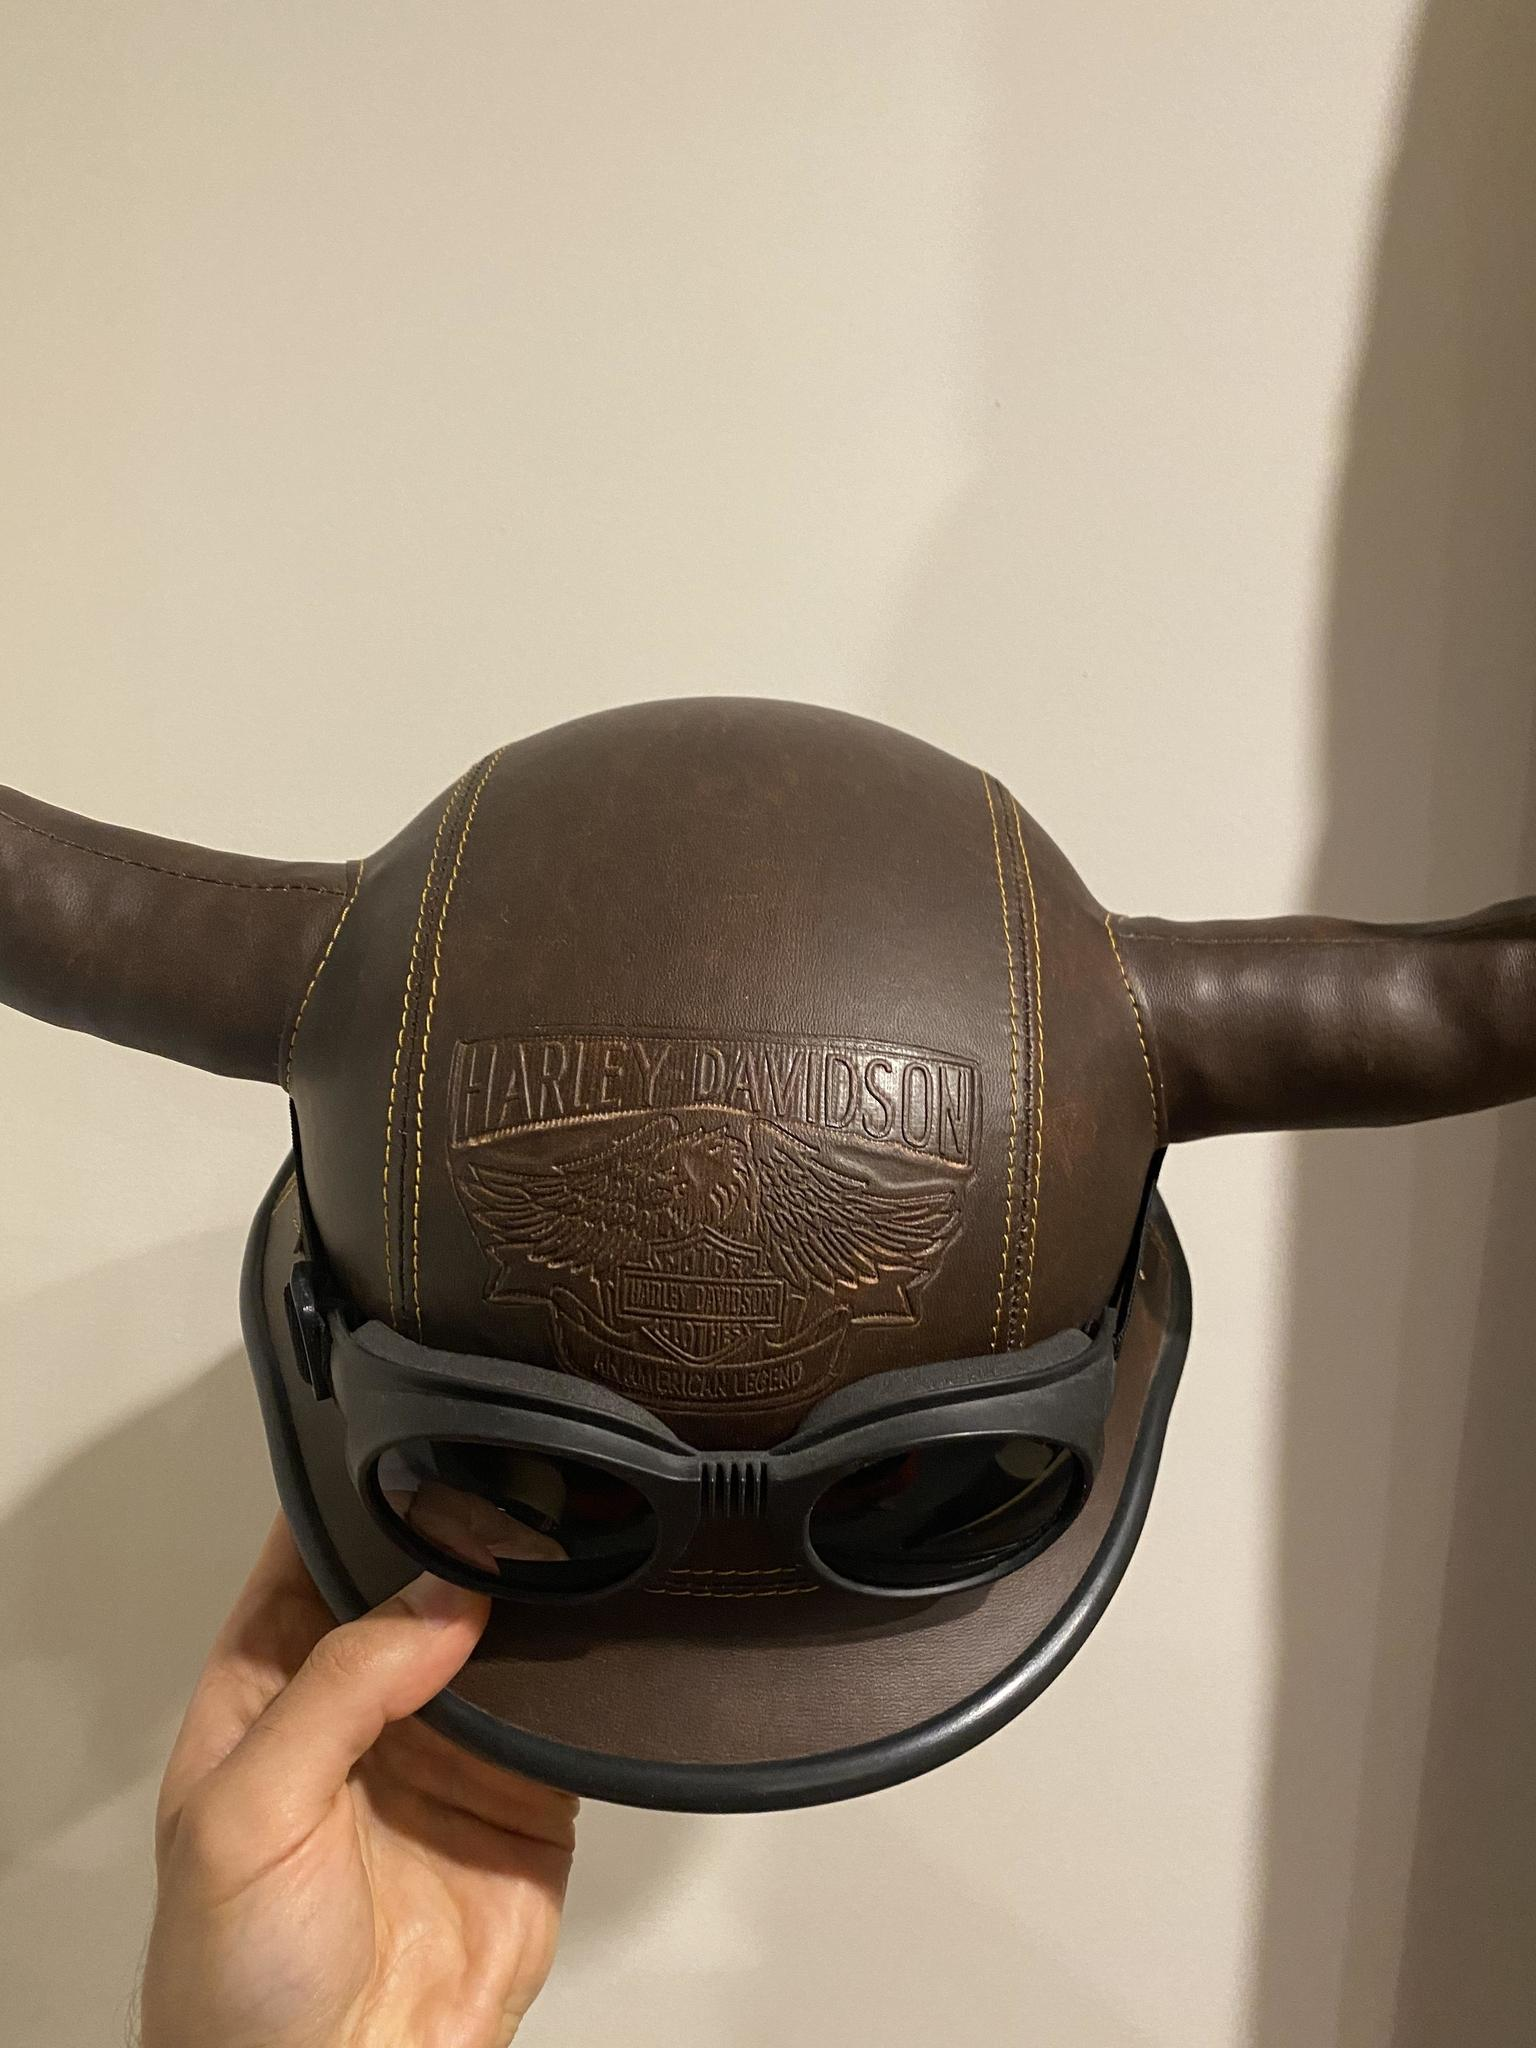 Motorbike helmet with horns and harley davidson wr